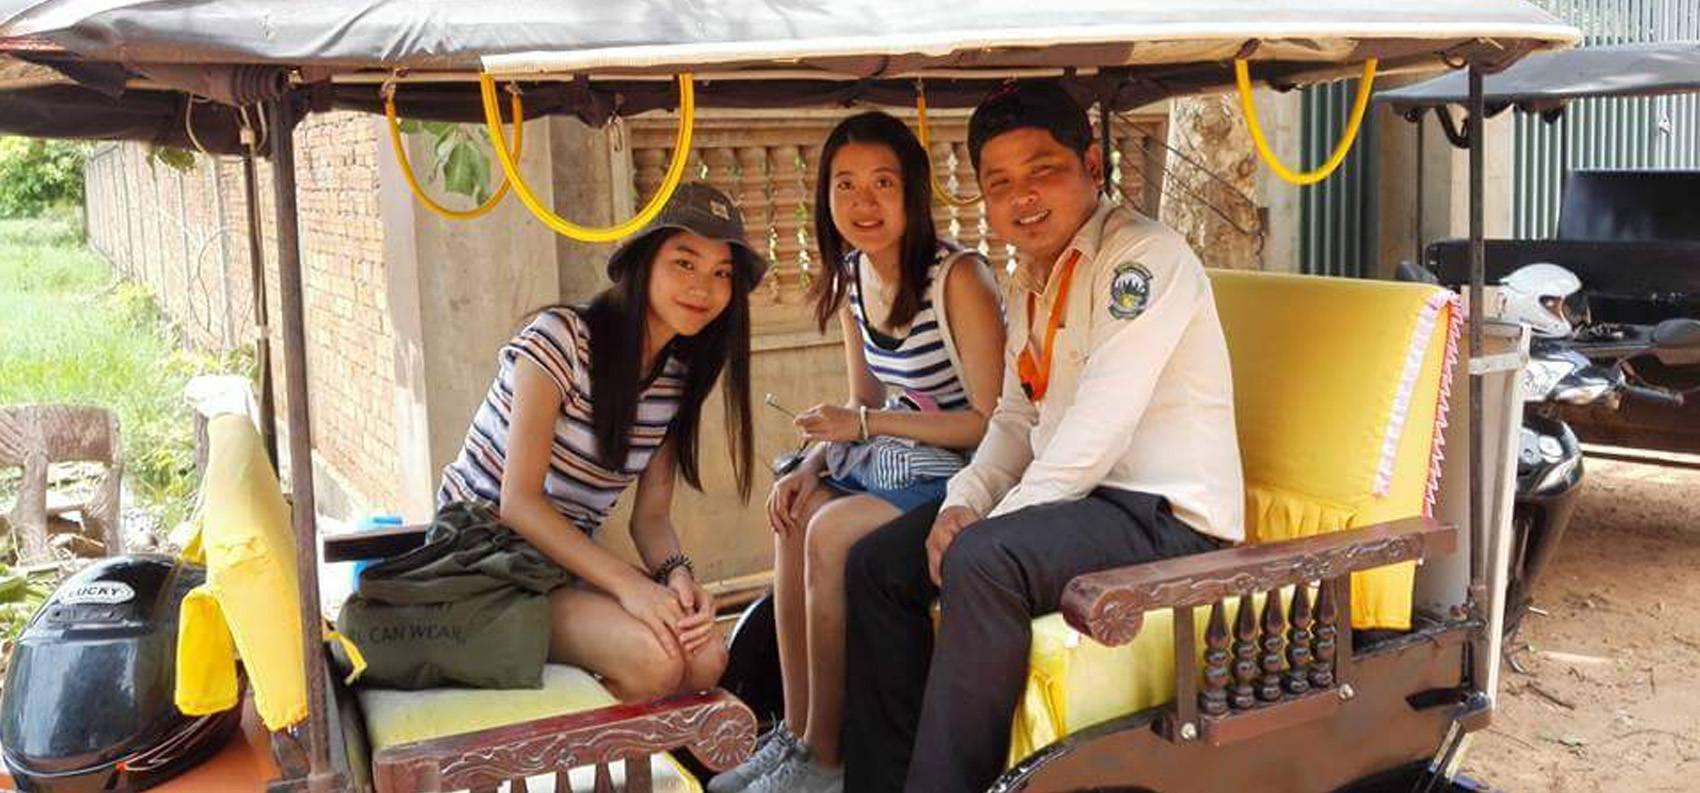 cambodia-tour-guide.jpg